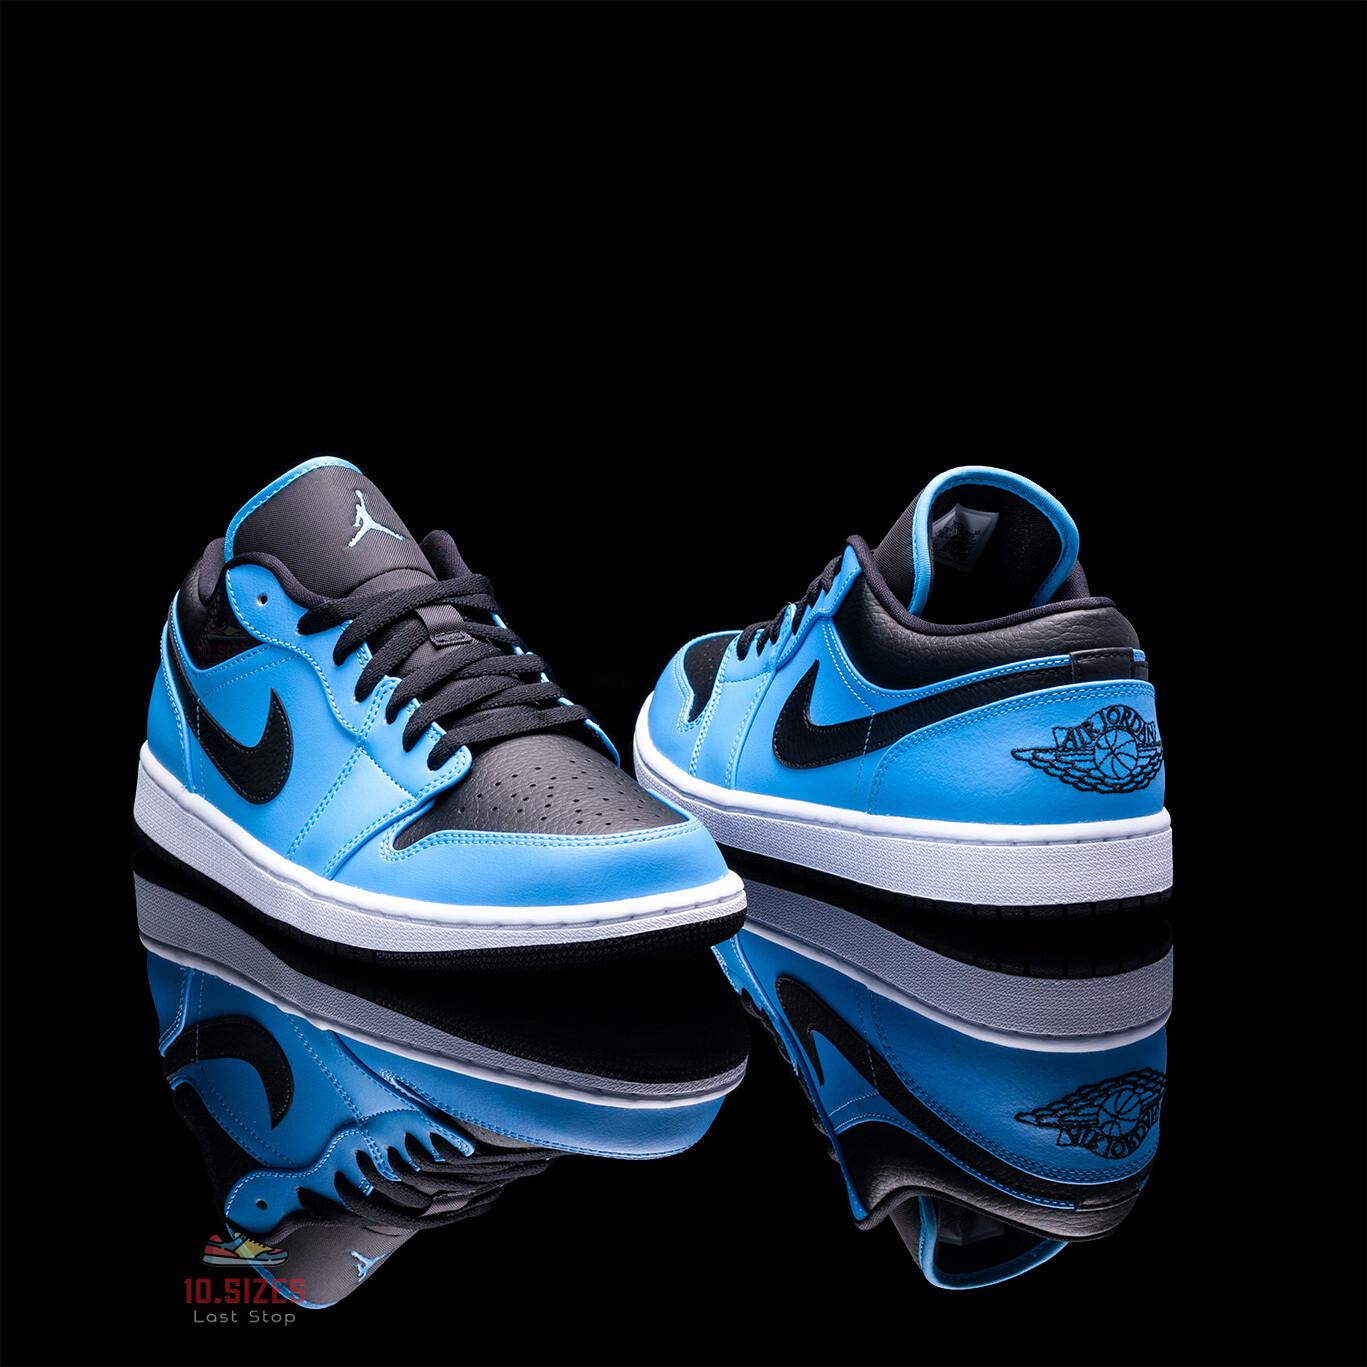 AIR JORDAN 1 LOW 'UNIVERSITY BLUE BLACK'